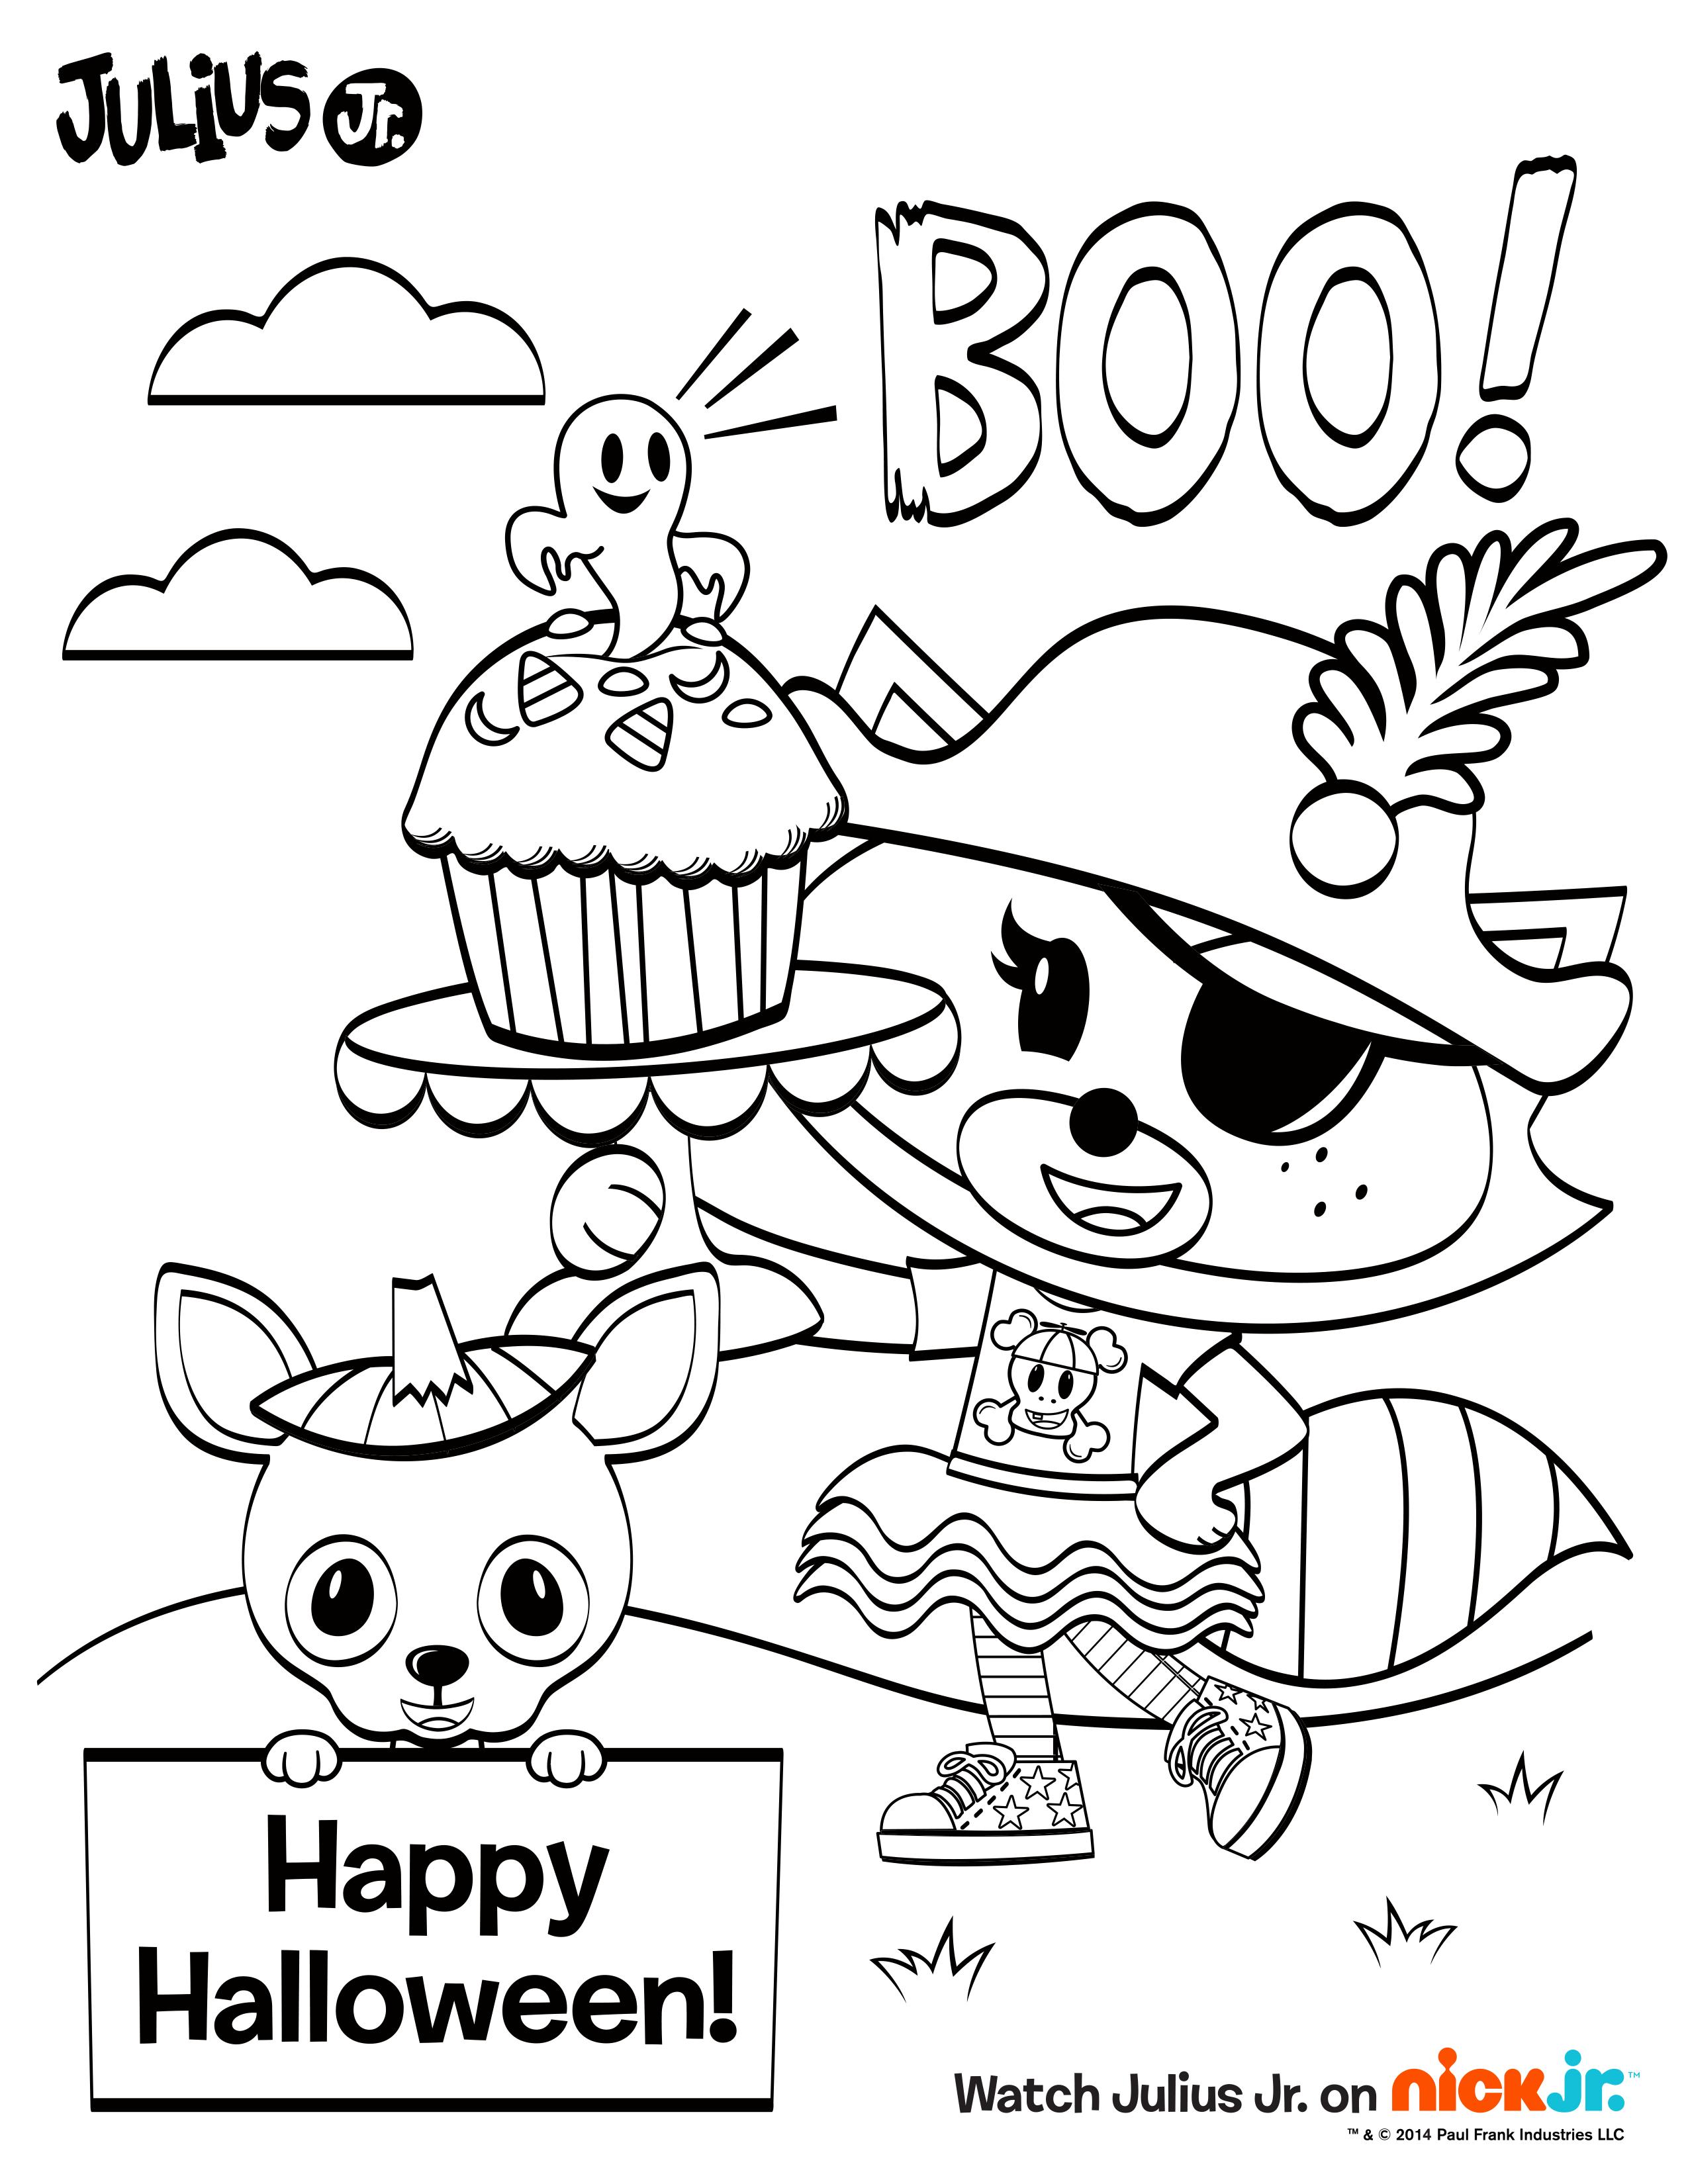 boo  your kids will love coloring this fun  juliusjr